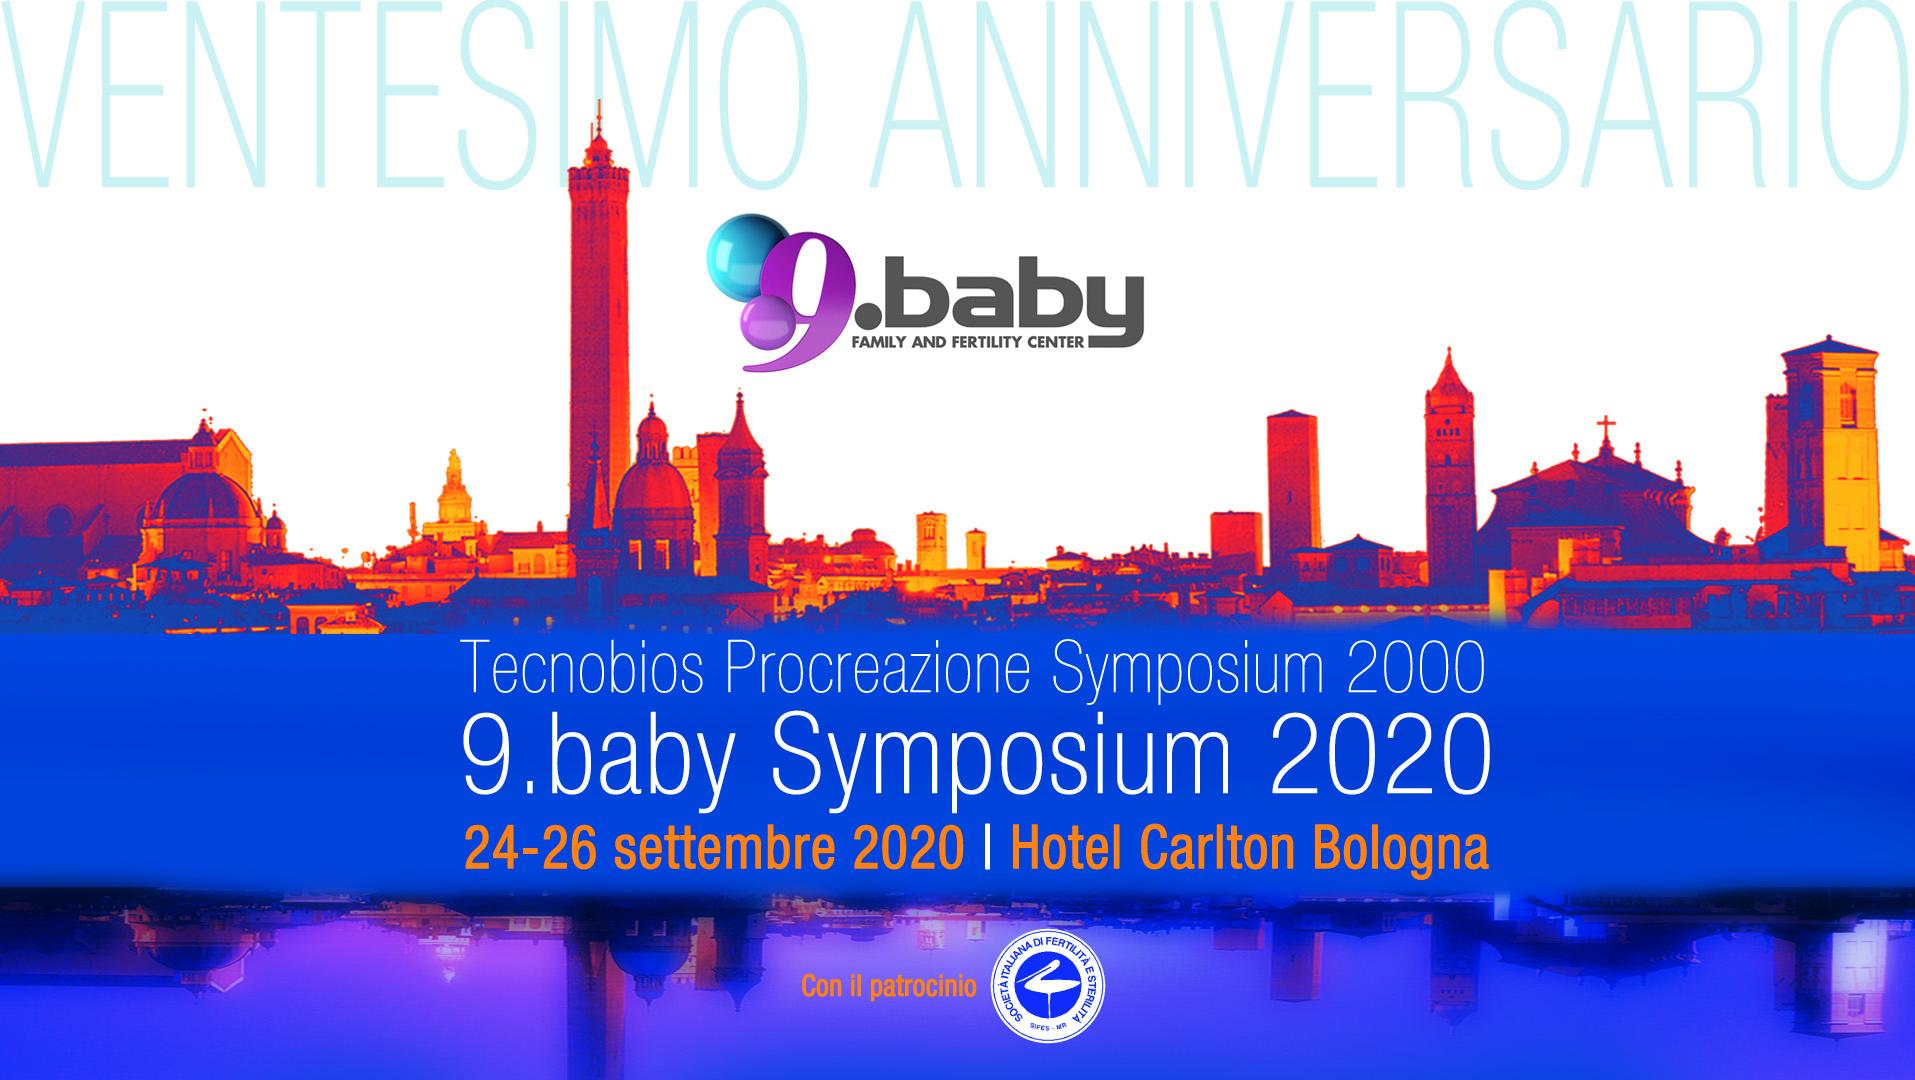 9.baby - Symposium2020